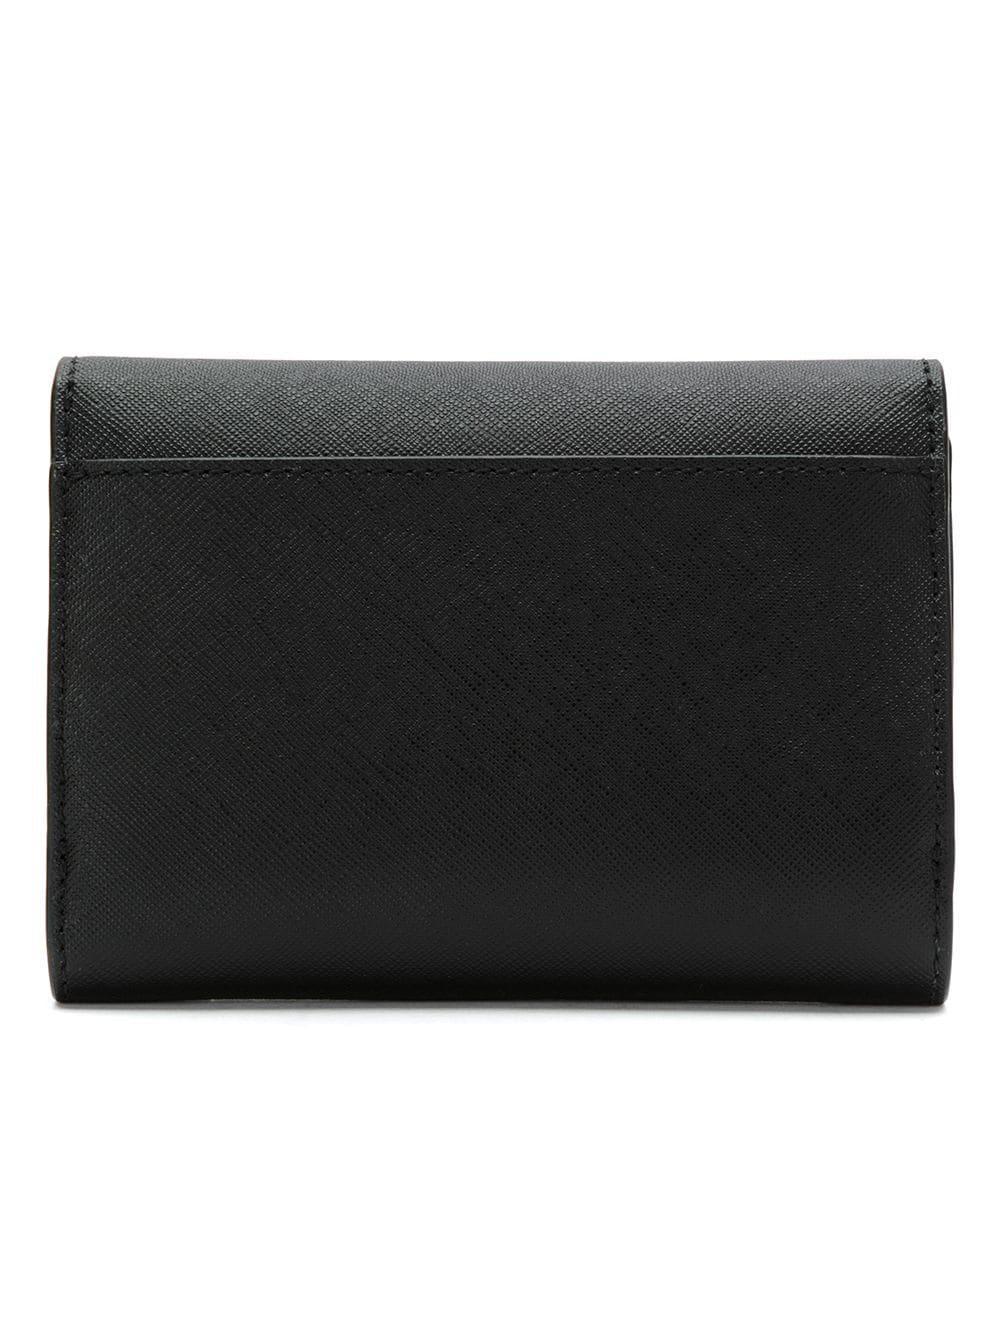 3b854d4adc3e Tory Burch - Blue Parker Foldable Mini Wallet - Lyst. View fullscreen